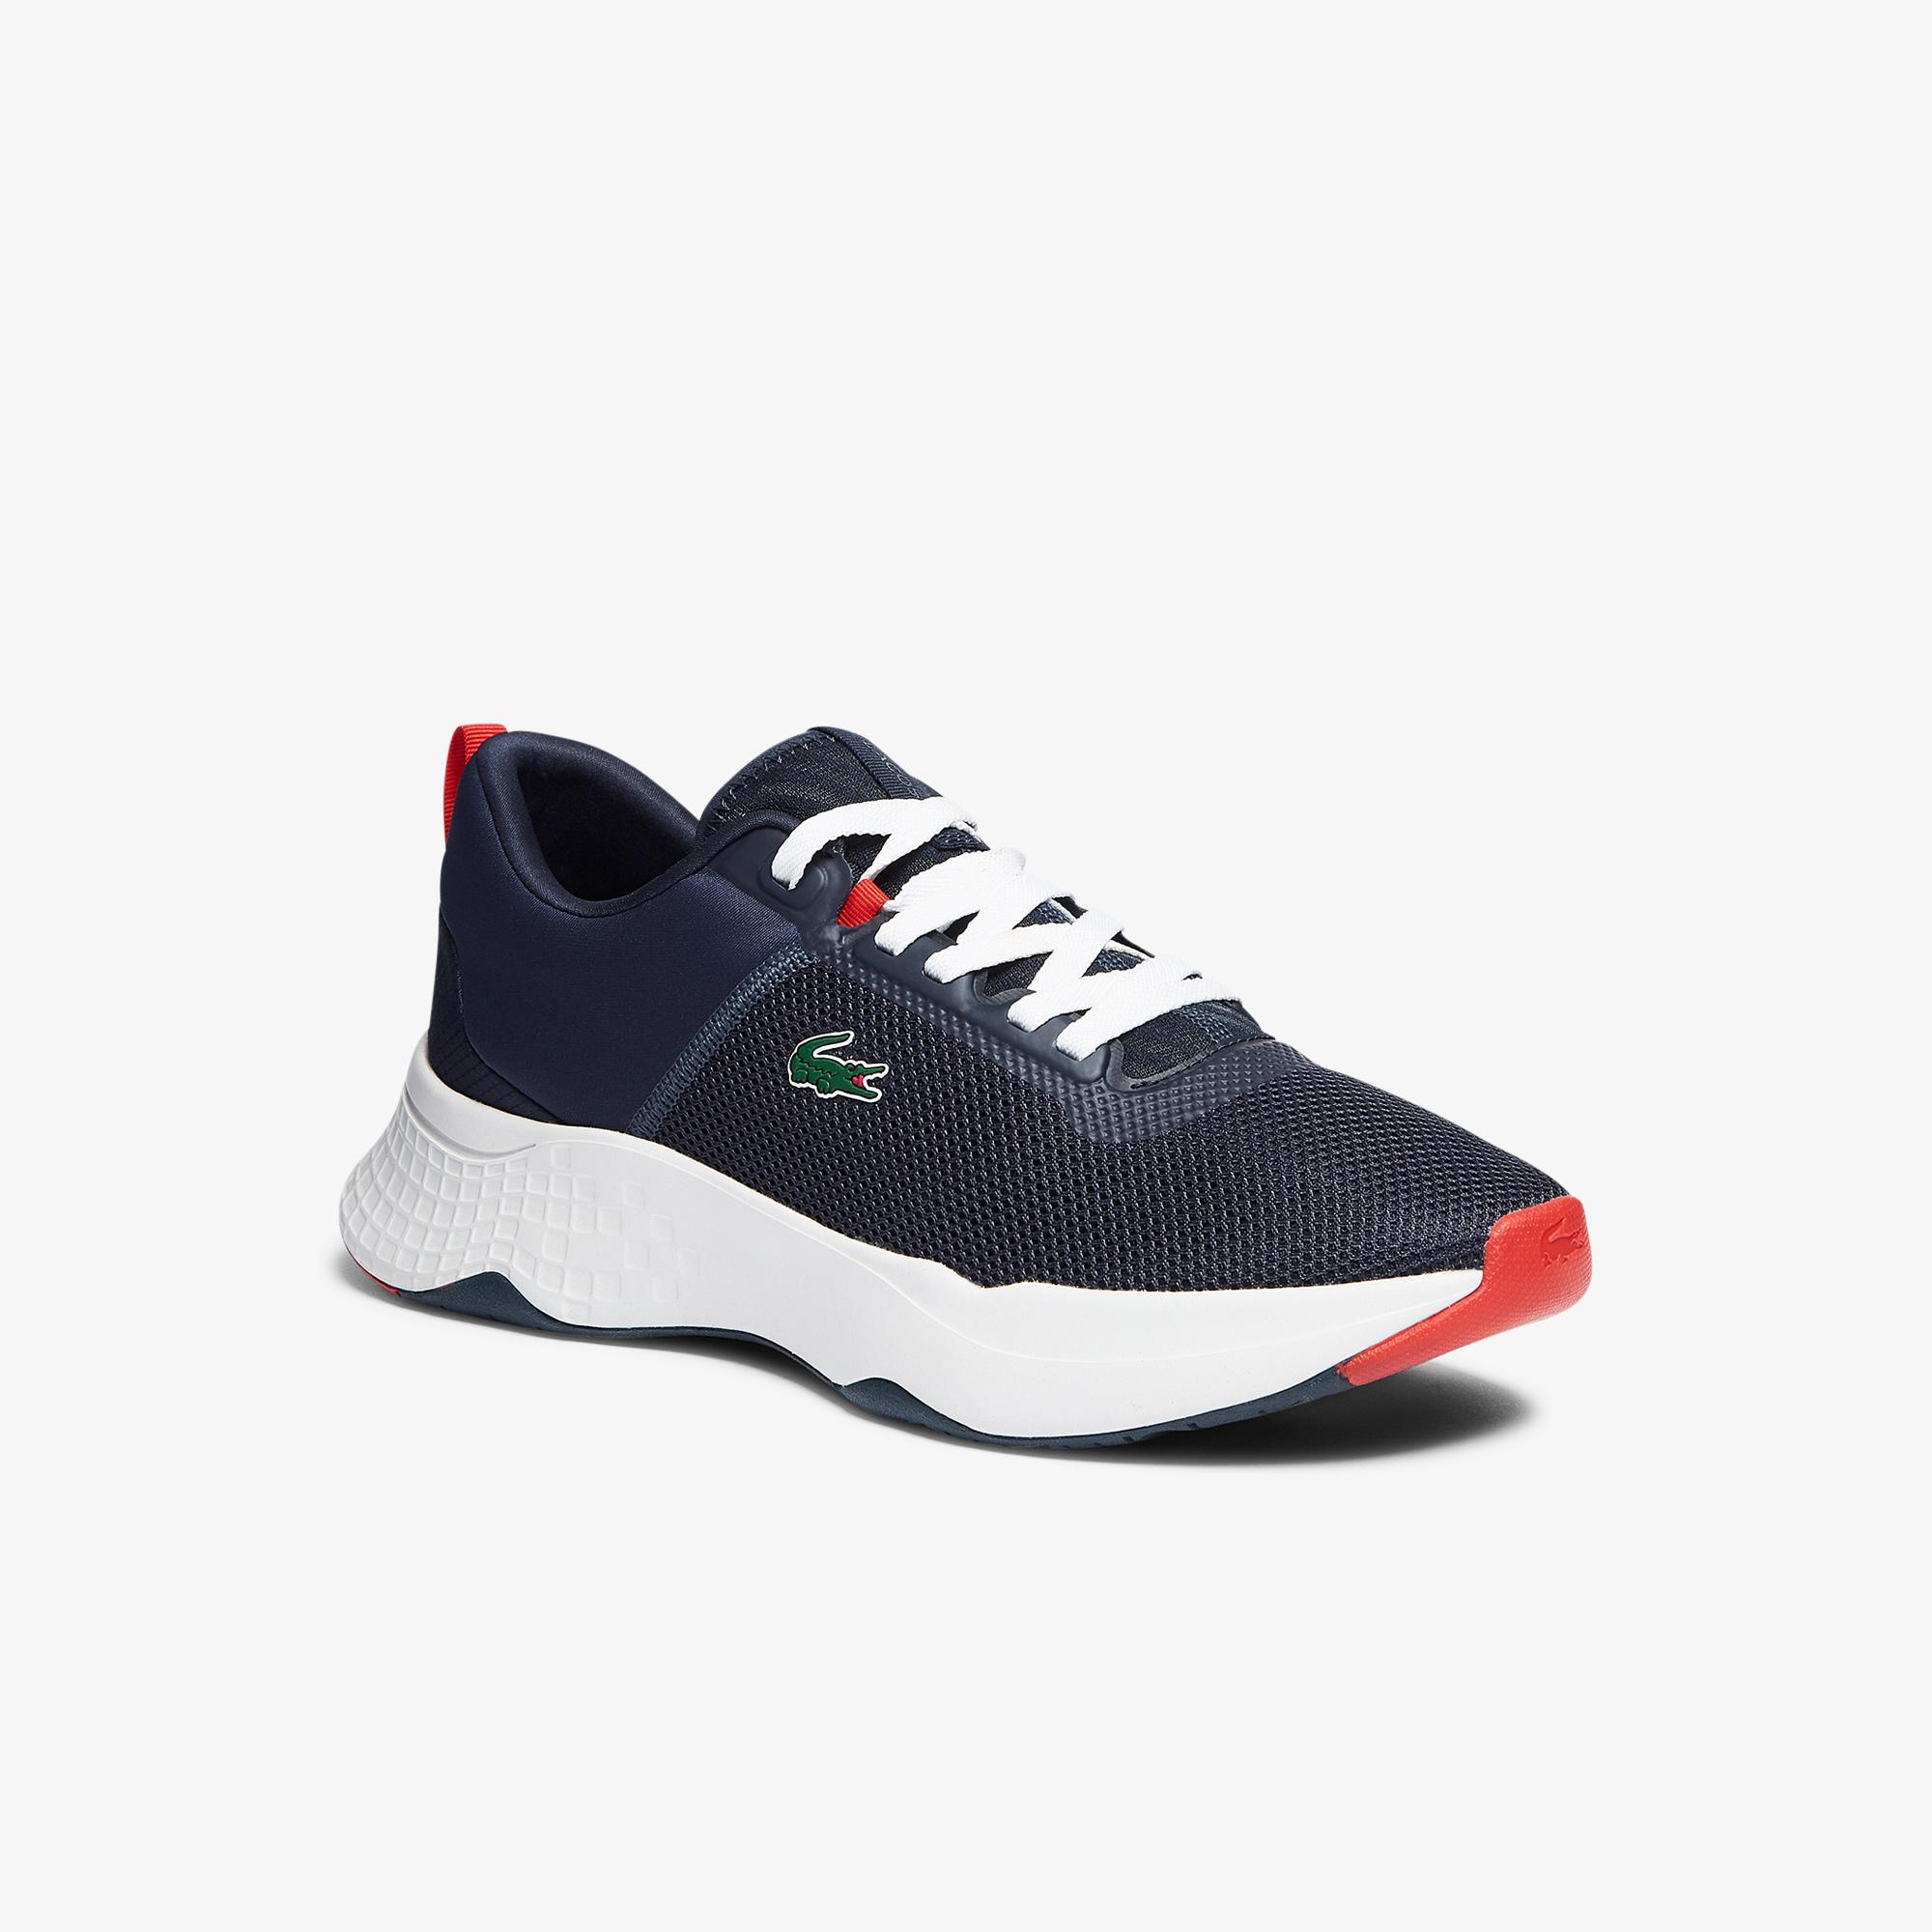 Lacoste Court-Drive 0721 1 Sma Erkek Lacivert - Kırmızı Sneaker